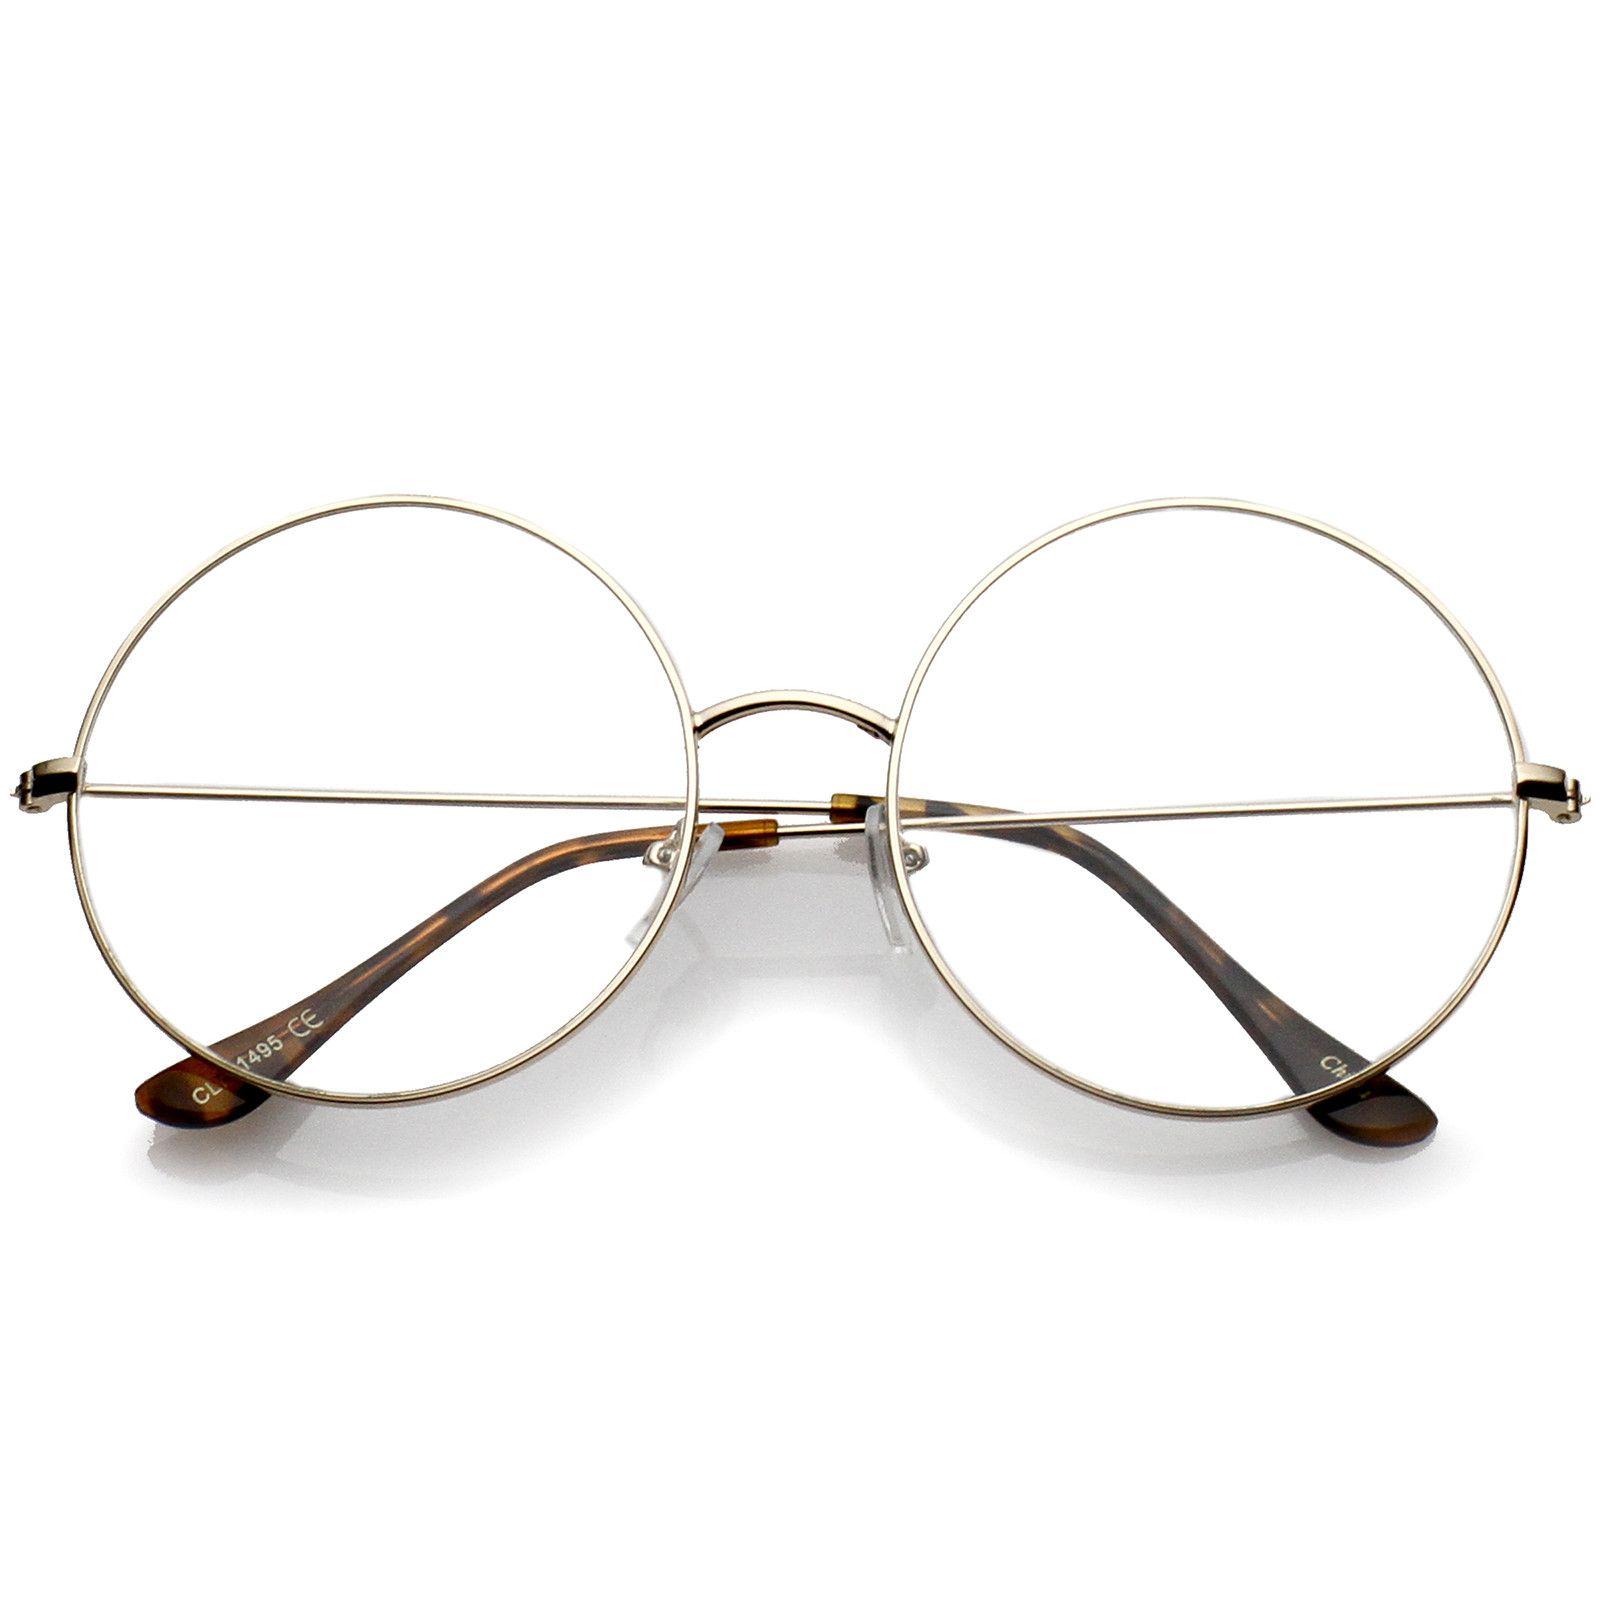 27ab2038943 Classic Oversize Slim Metal Frame Clear Flat Lens Round Eyeglasses 56mm   frame  clear  oversized  bold  purple  sunglasses  cateye  sunglass   sunglassla   ...